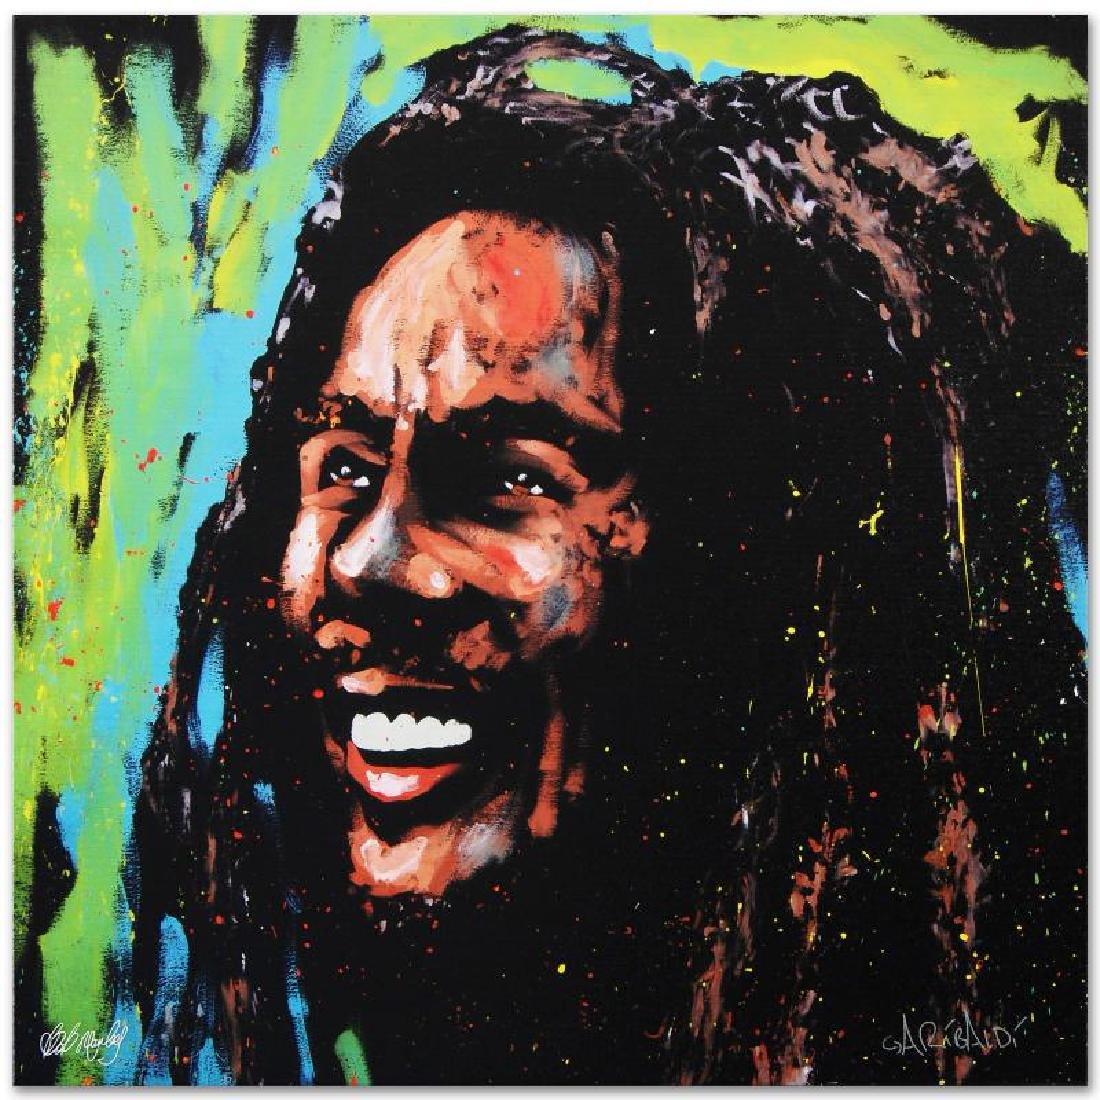 Bob Marley (Marley) by Garibaldi, David - 3